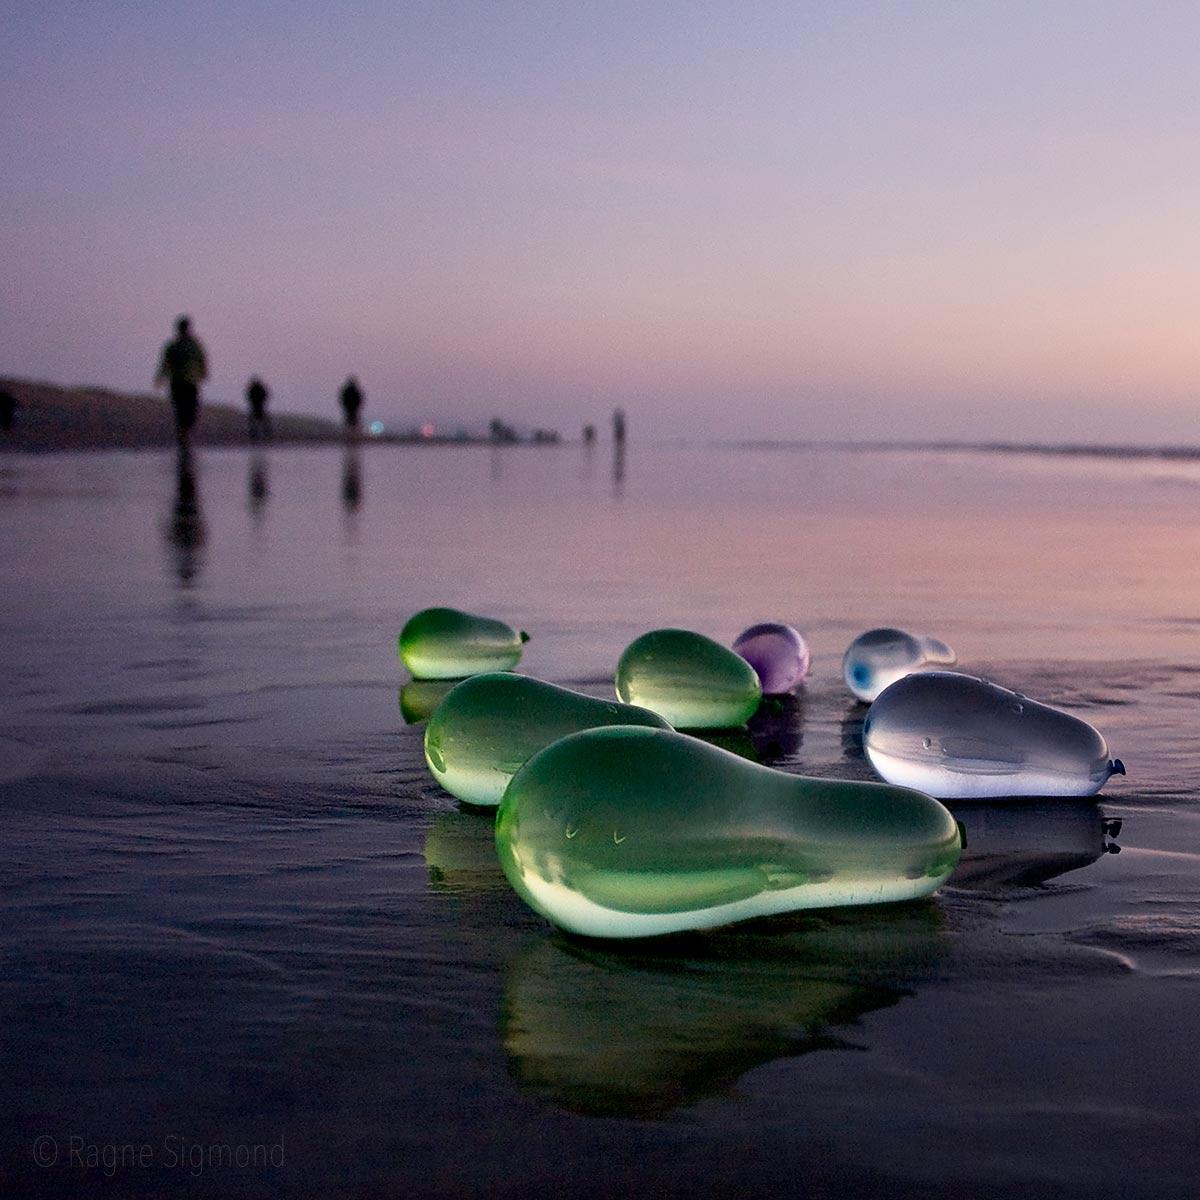 balloons_stranded_Ragne-Sigmond